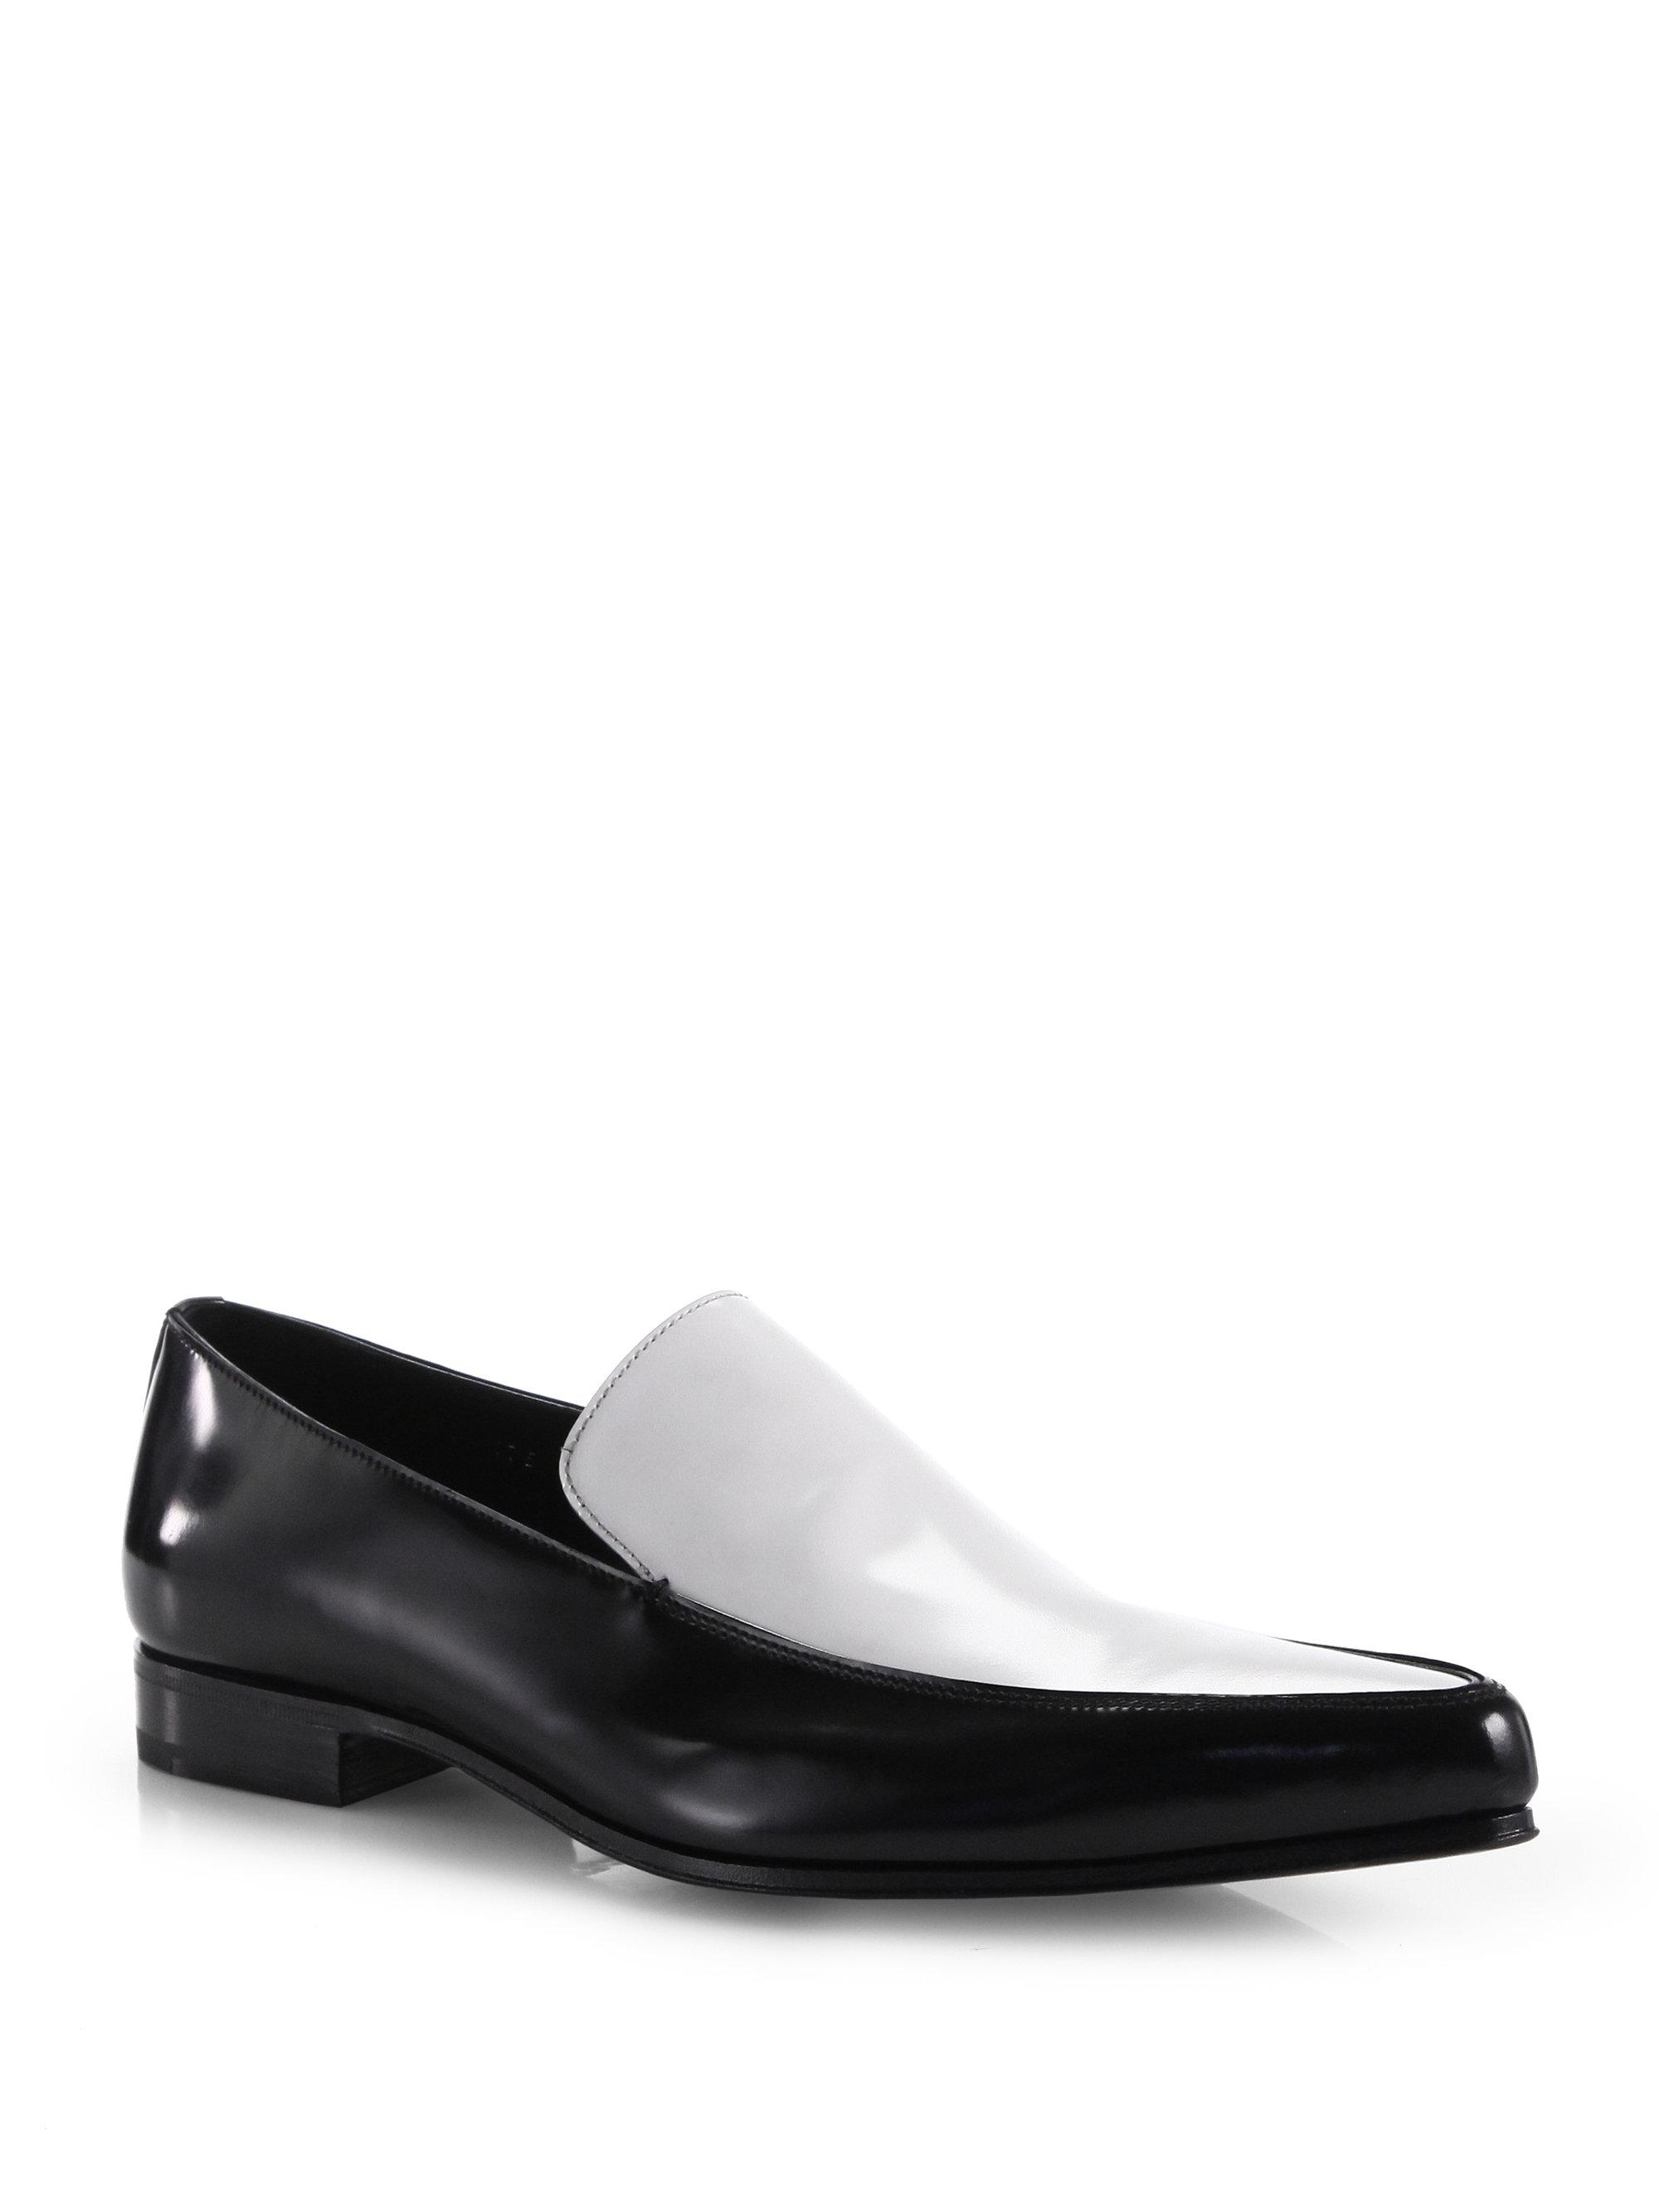 lyst prada bicolor venetian dress shoes in black for men